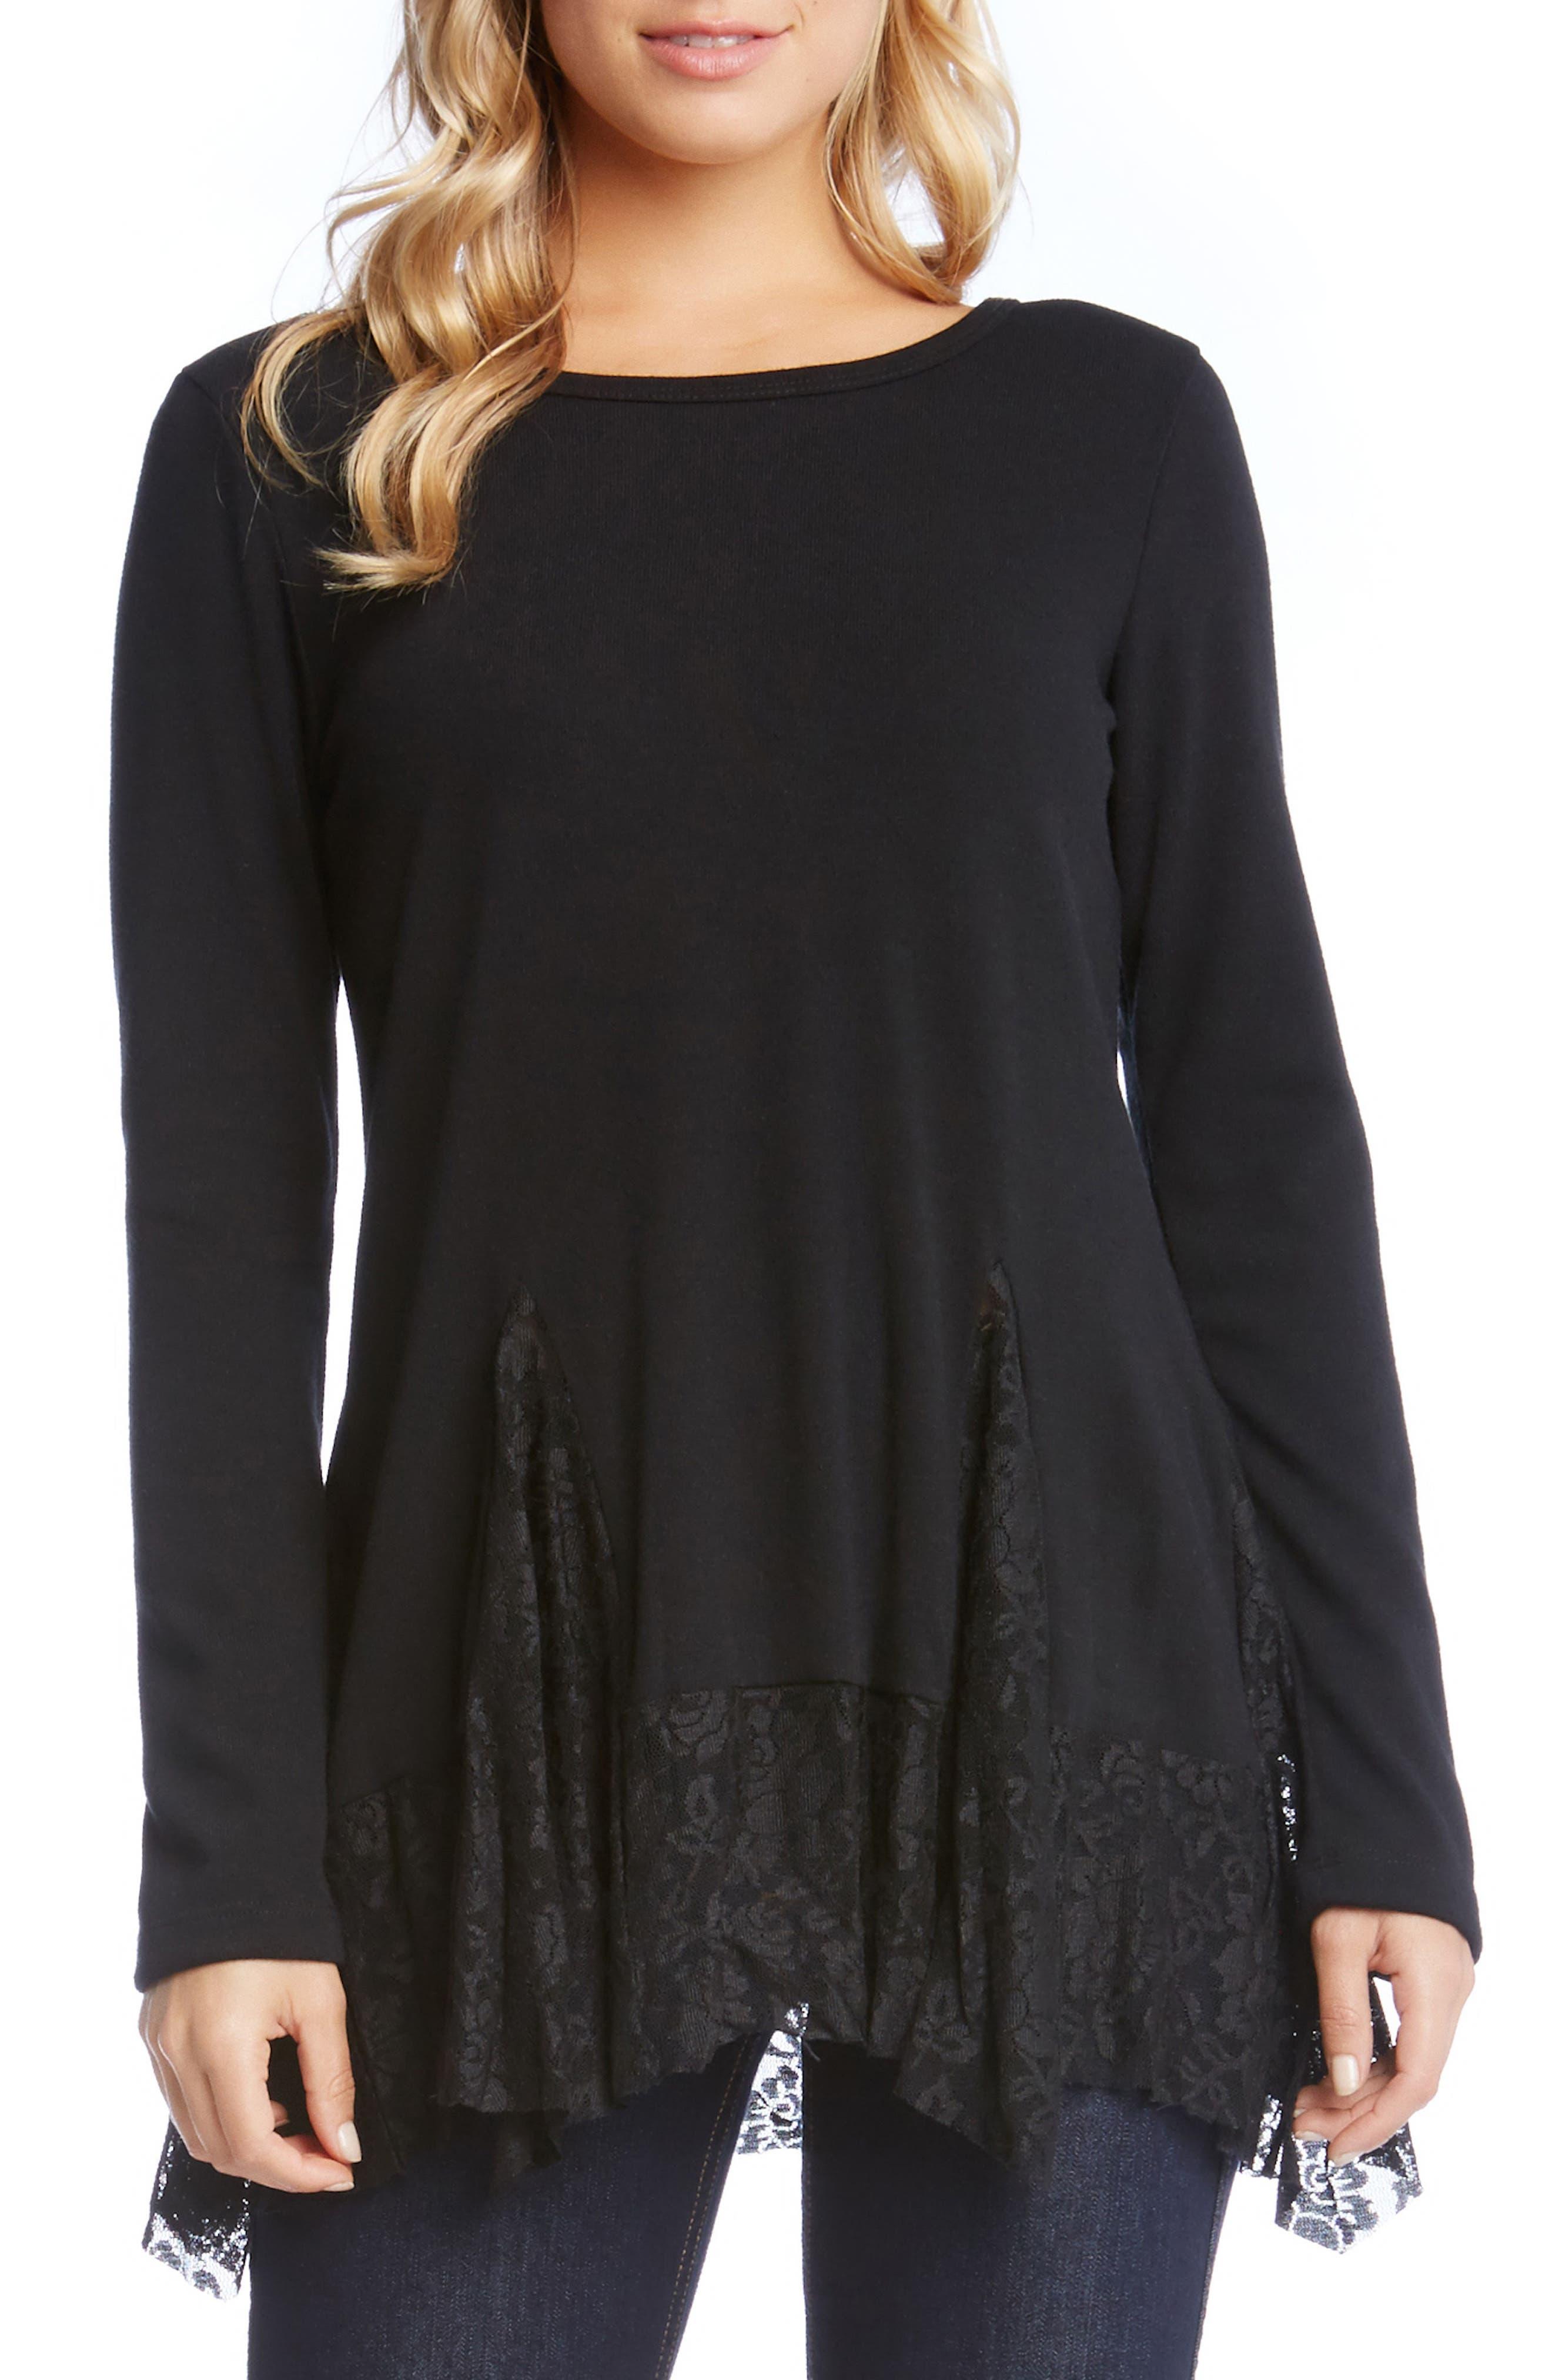 Karen Karen Lace Inset Sweater,                         Main,                         color, 001